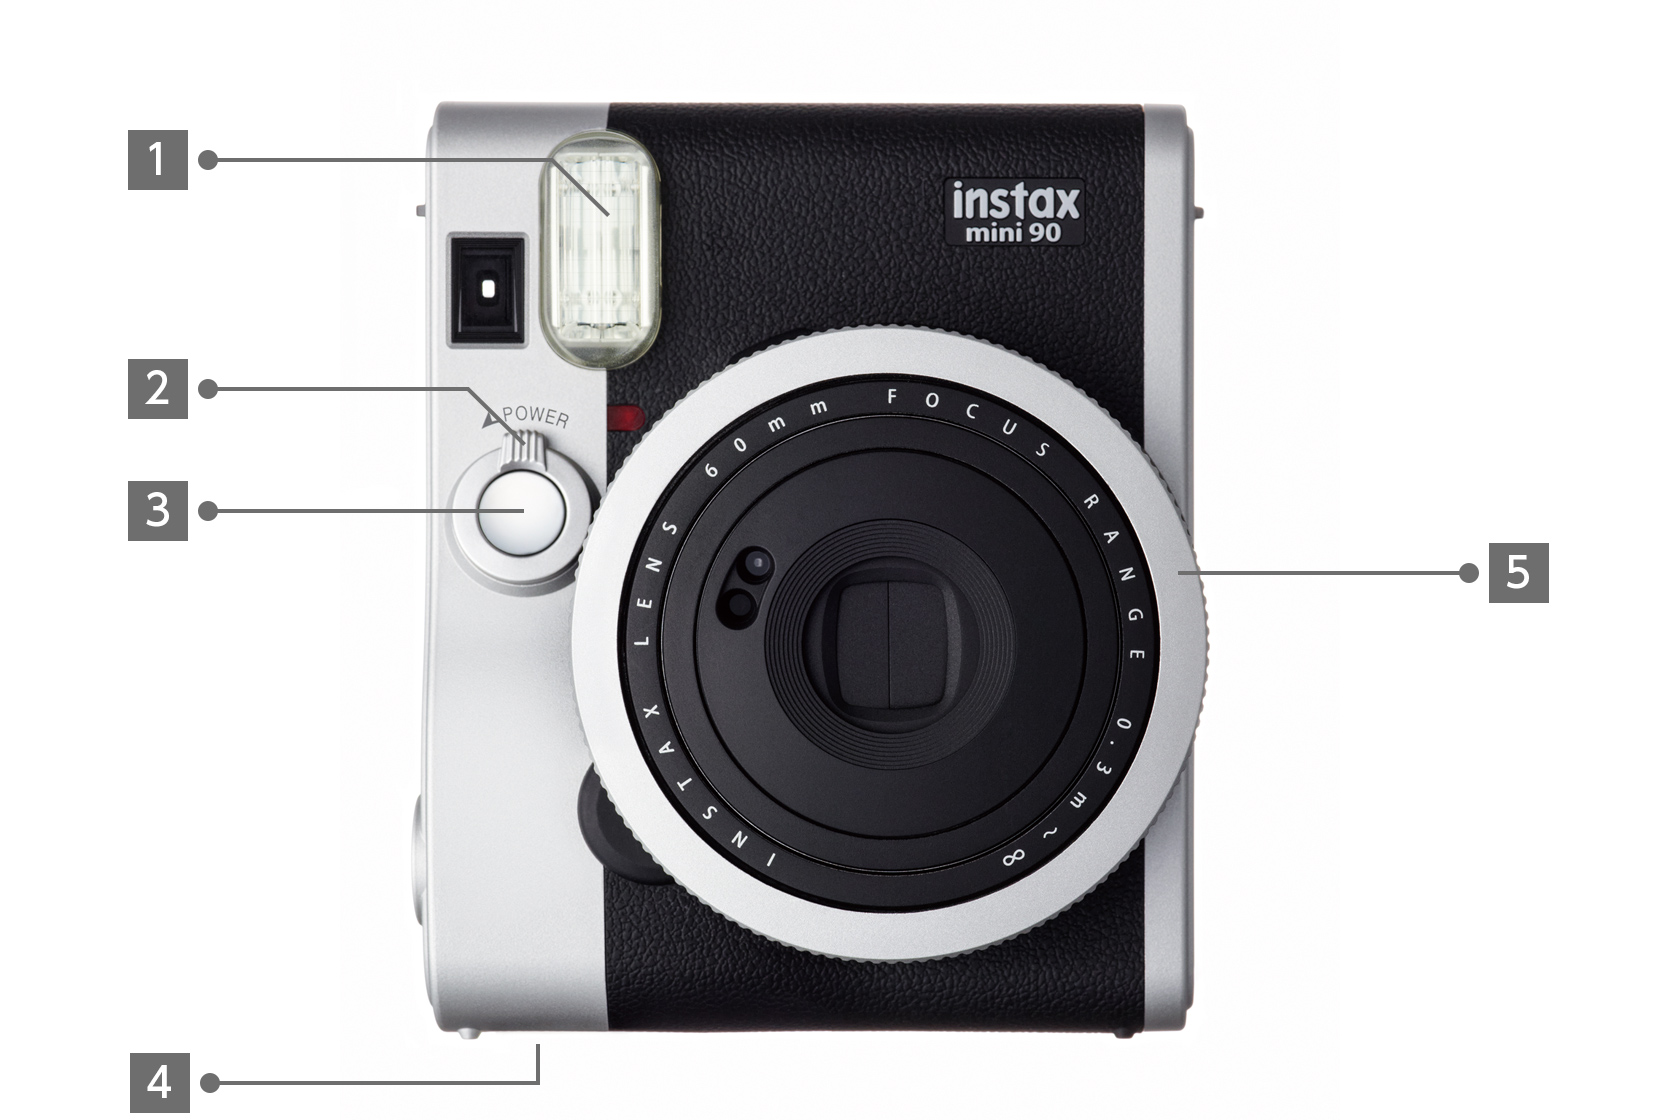 Front View of black Mini 90 camera